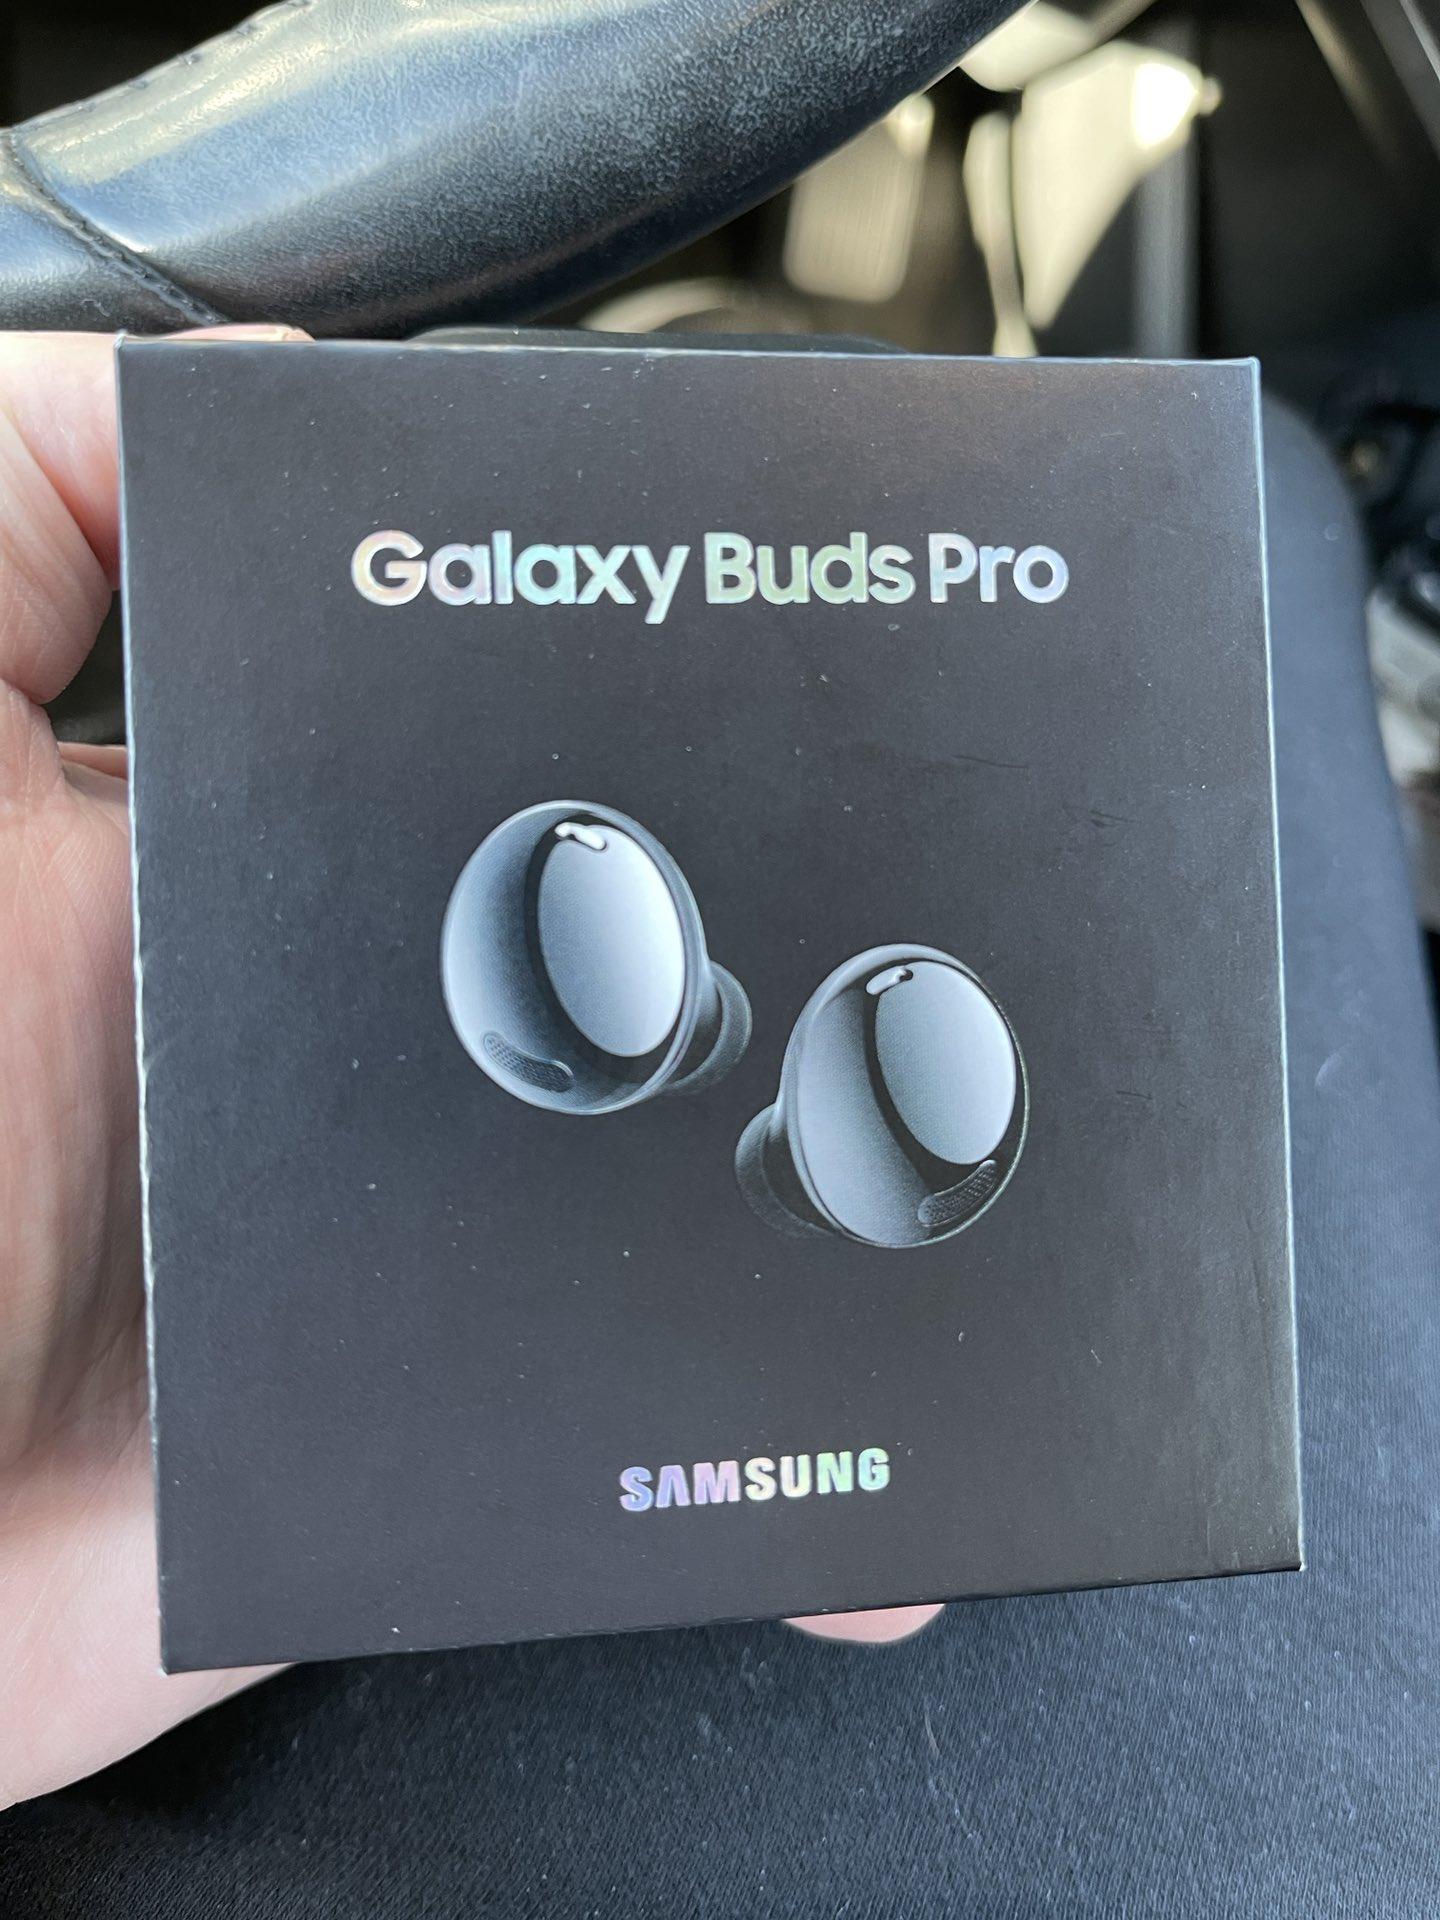 Samsung Galaxy Buds Pro earbuds fotos